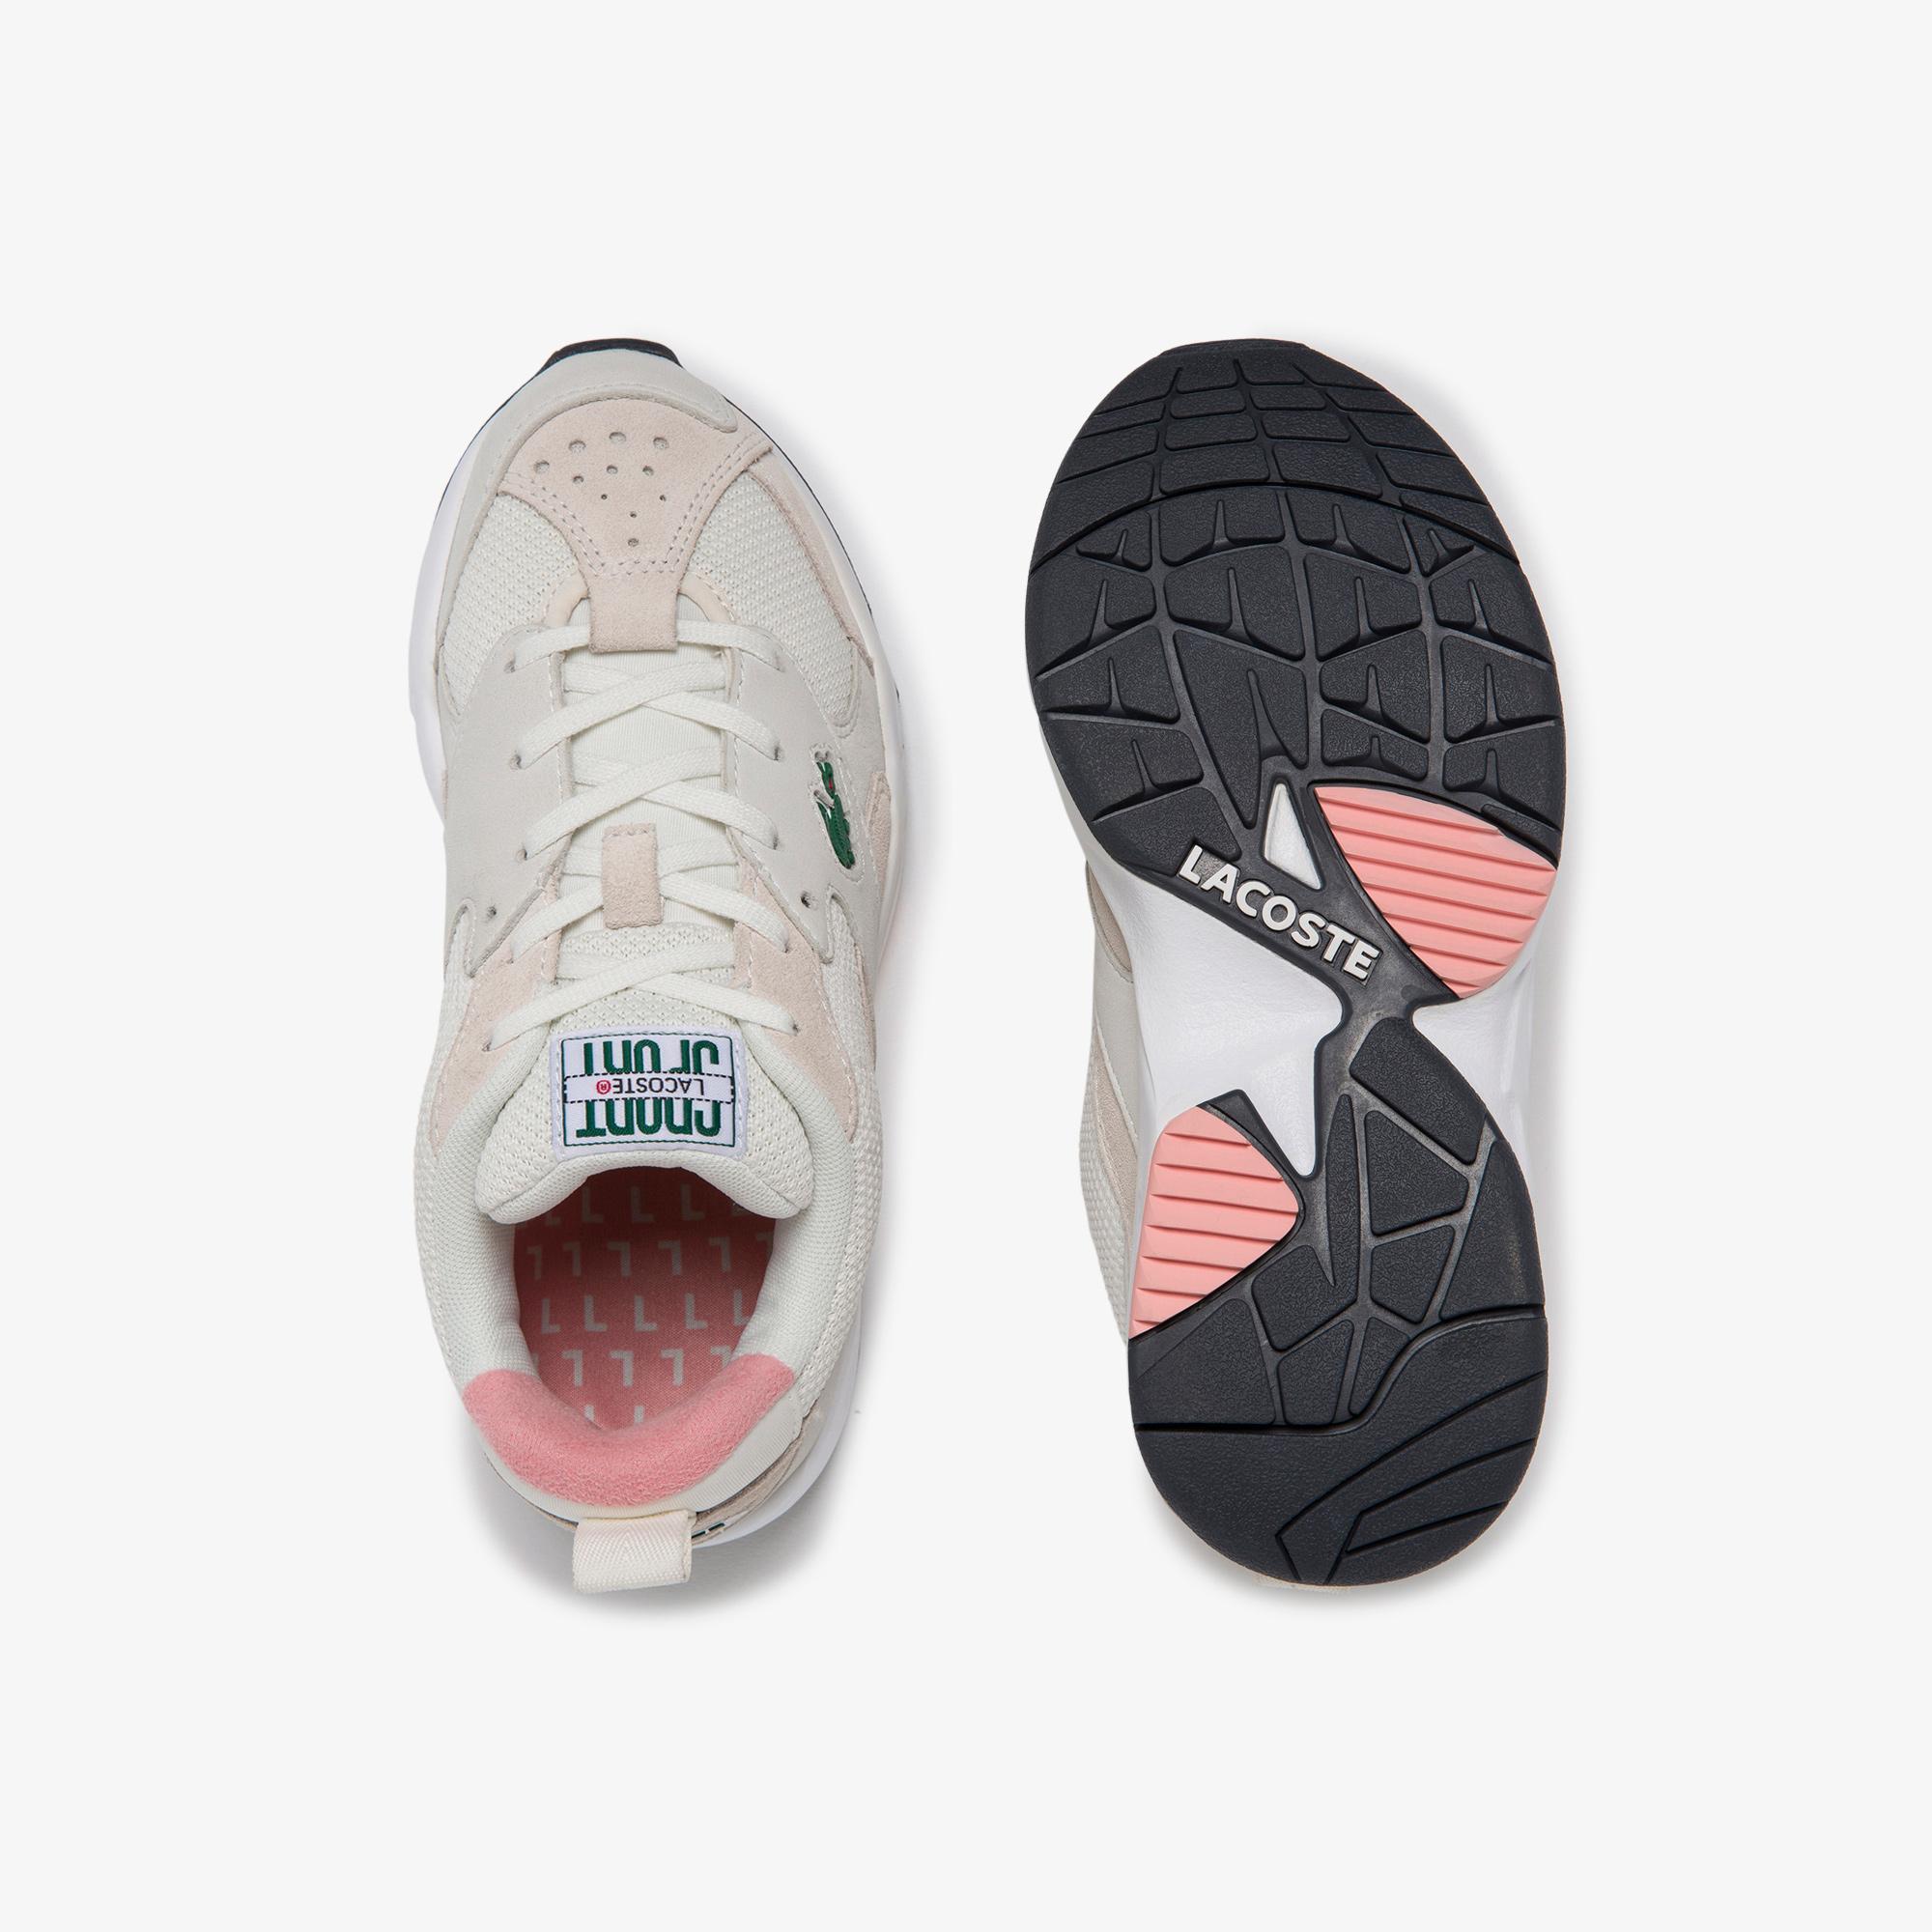 Lacoste Women'S Storm 96 120 3 Us Sfa Leather Sneakers